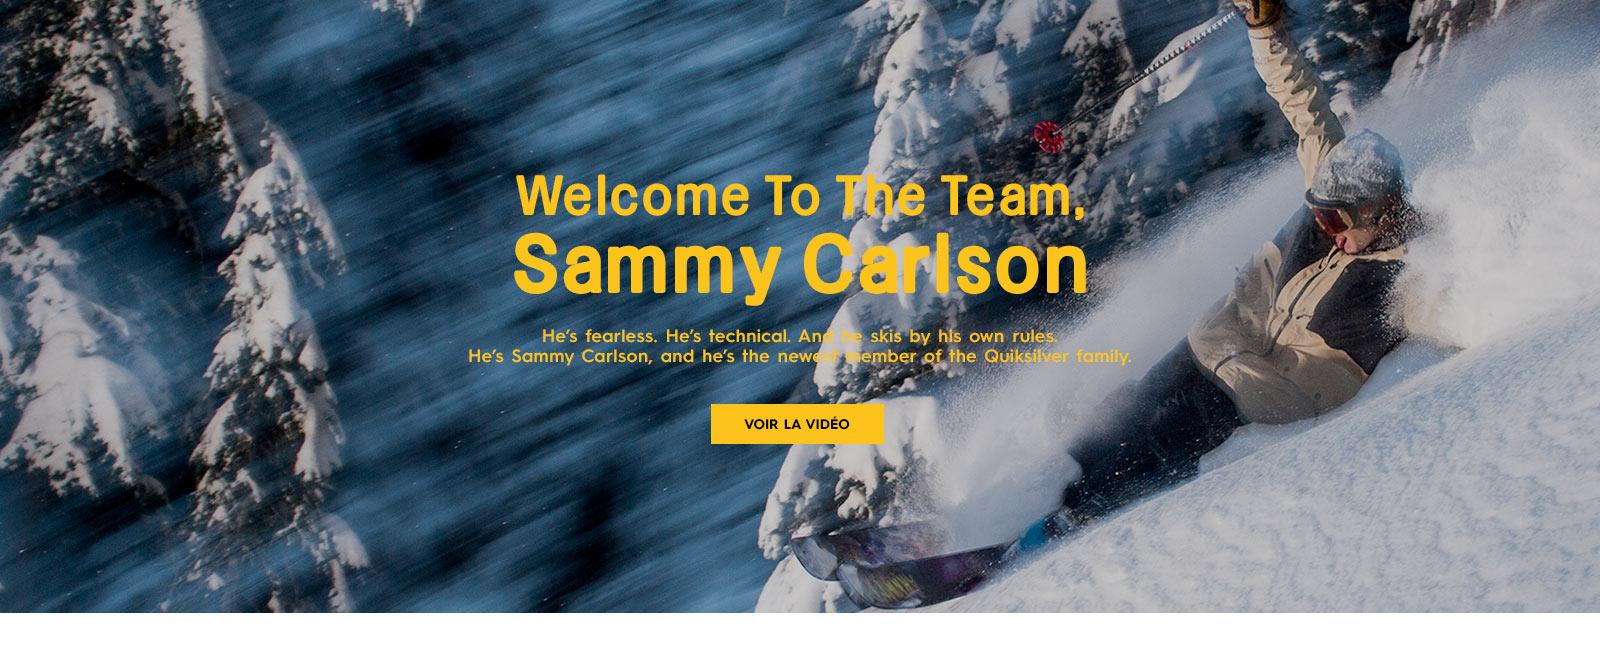 Carte Cadeau Quiksilver.Sammy Carlson Quiksilver